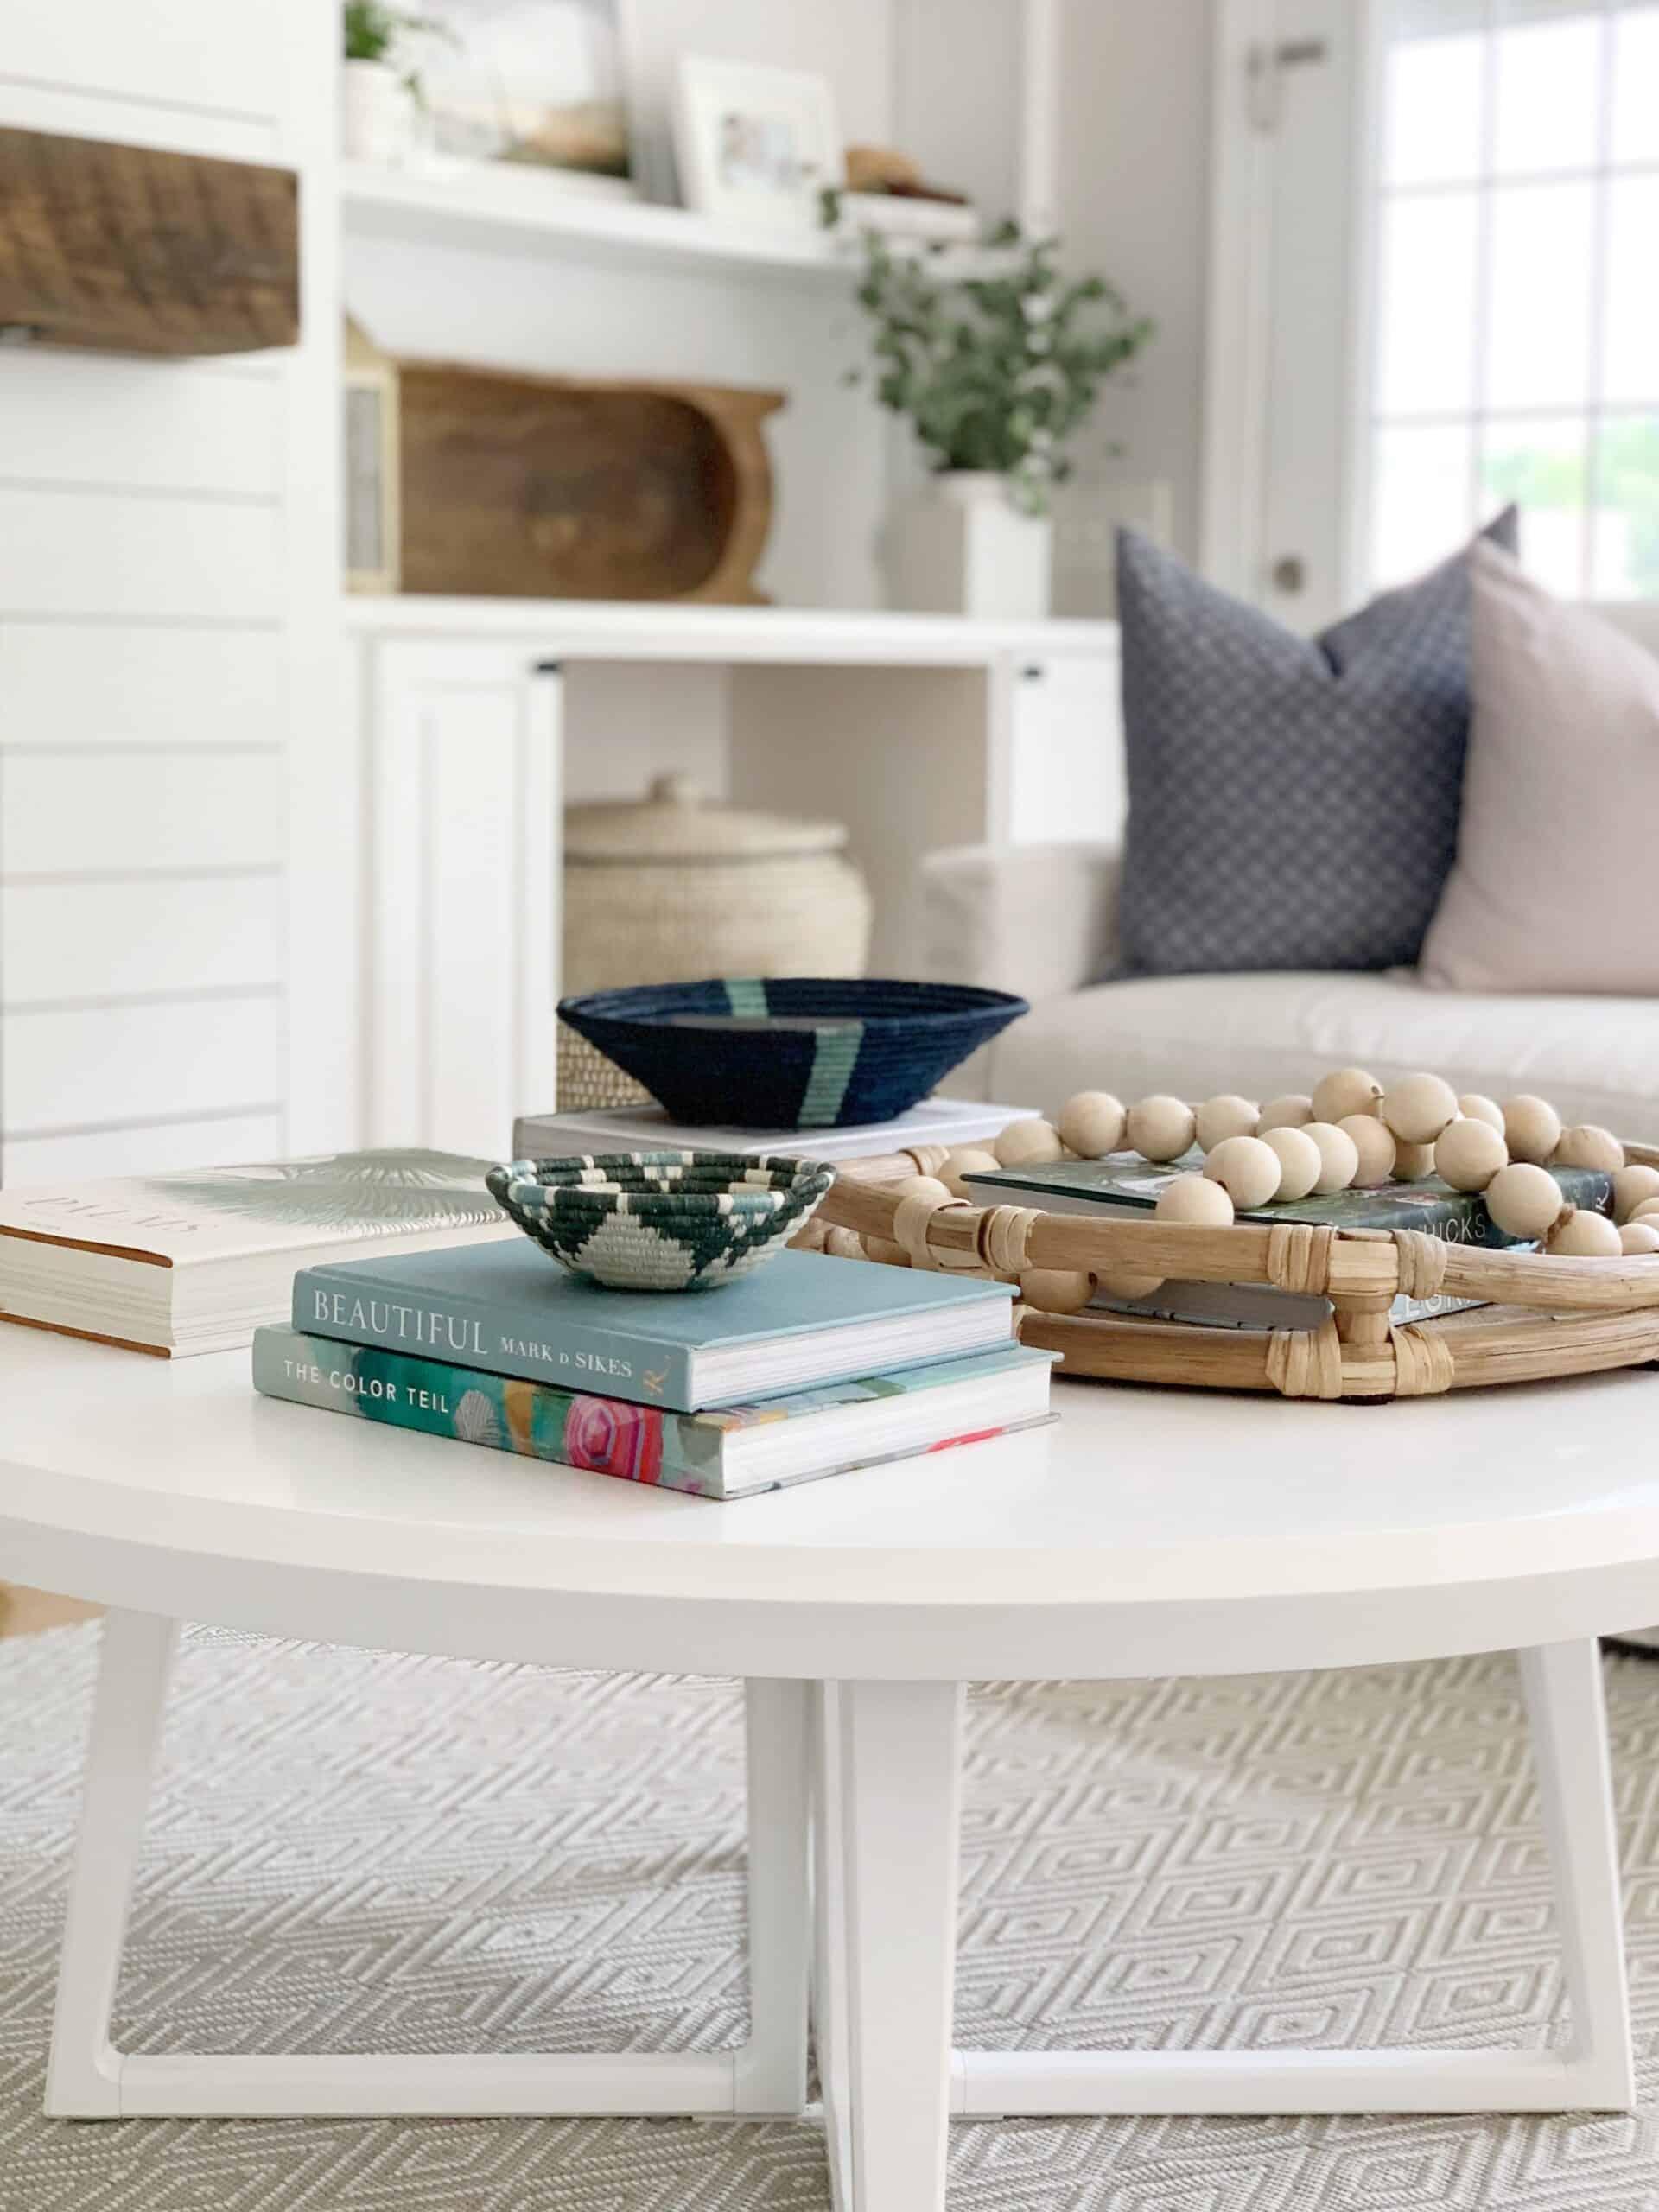 Beautiful books for styling your coffee table. #coastalbooks #coastaldecor #coffeetablebooks #coffeetablestyling #booksfordecor #decorbooks #prettybooks #serenaandlily #serenalily #coastallivingroom #livingroomdecor #interiordesign